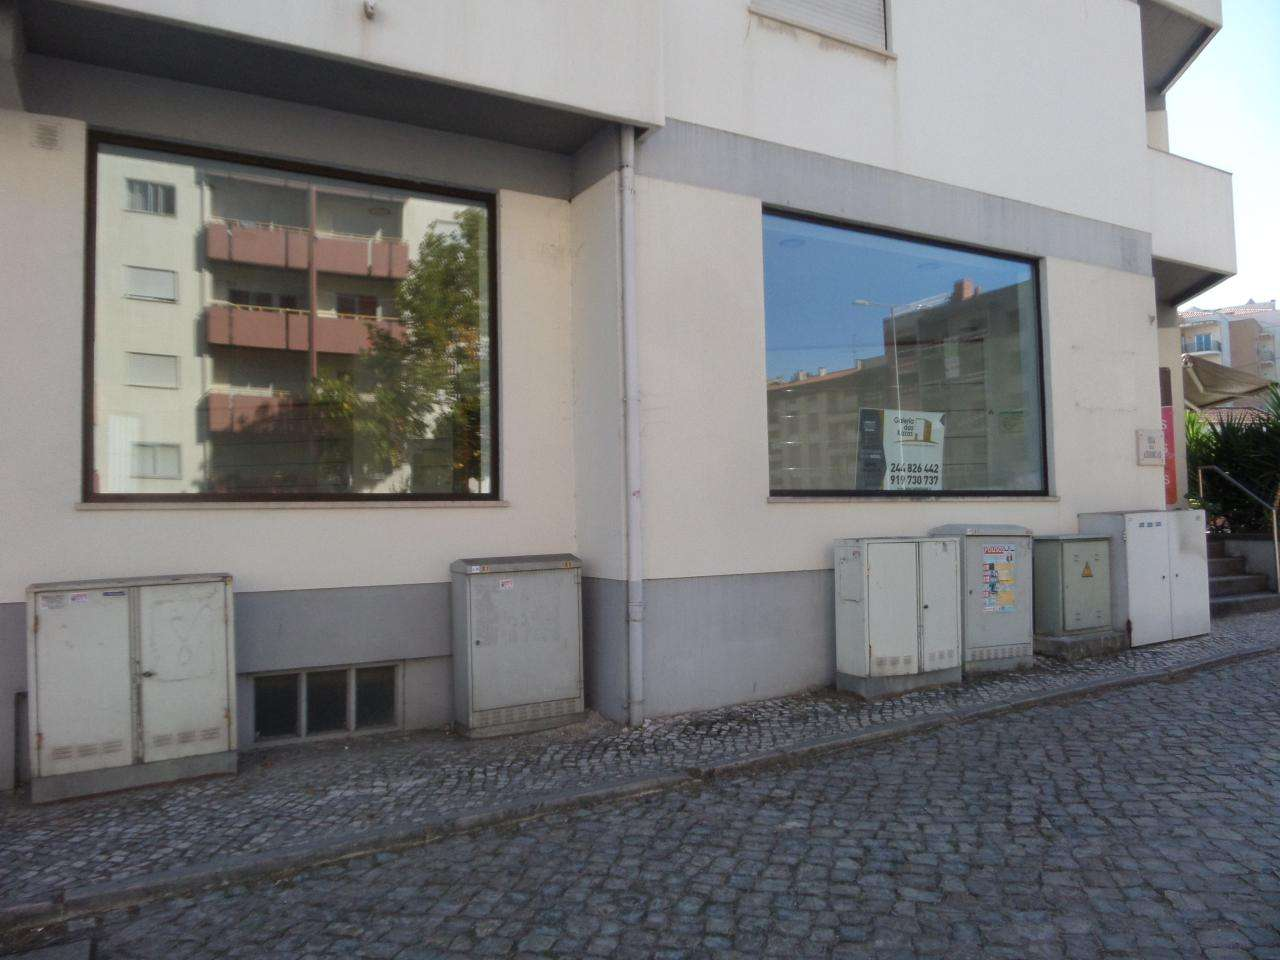 Loja para arrendar, Leiria, Pousos, Barreira e Cortes, Leiria - Foto 11